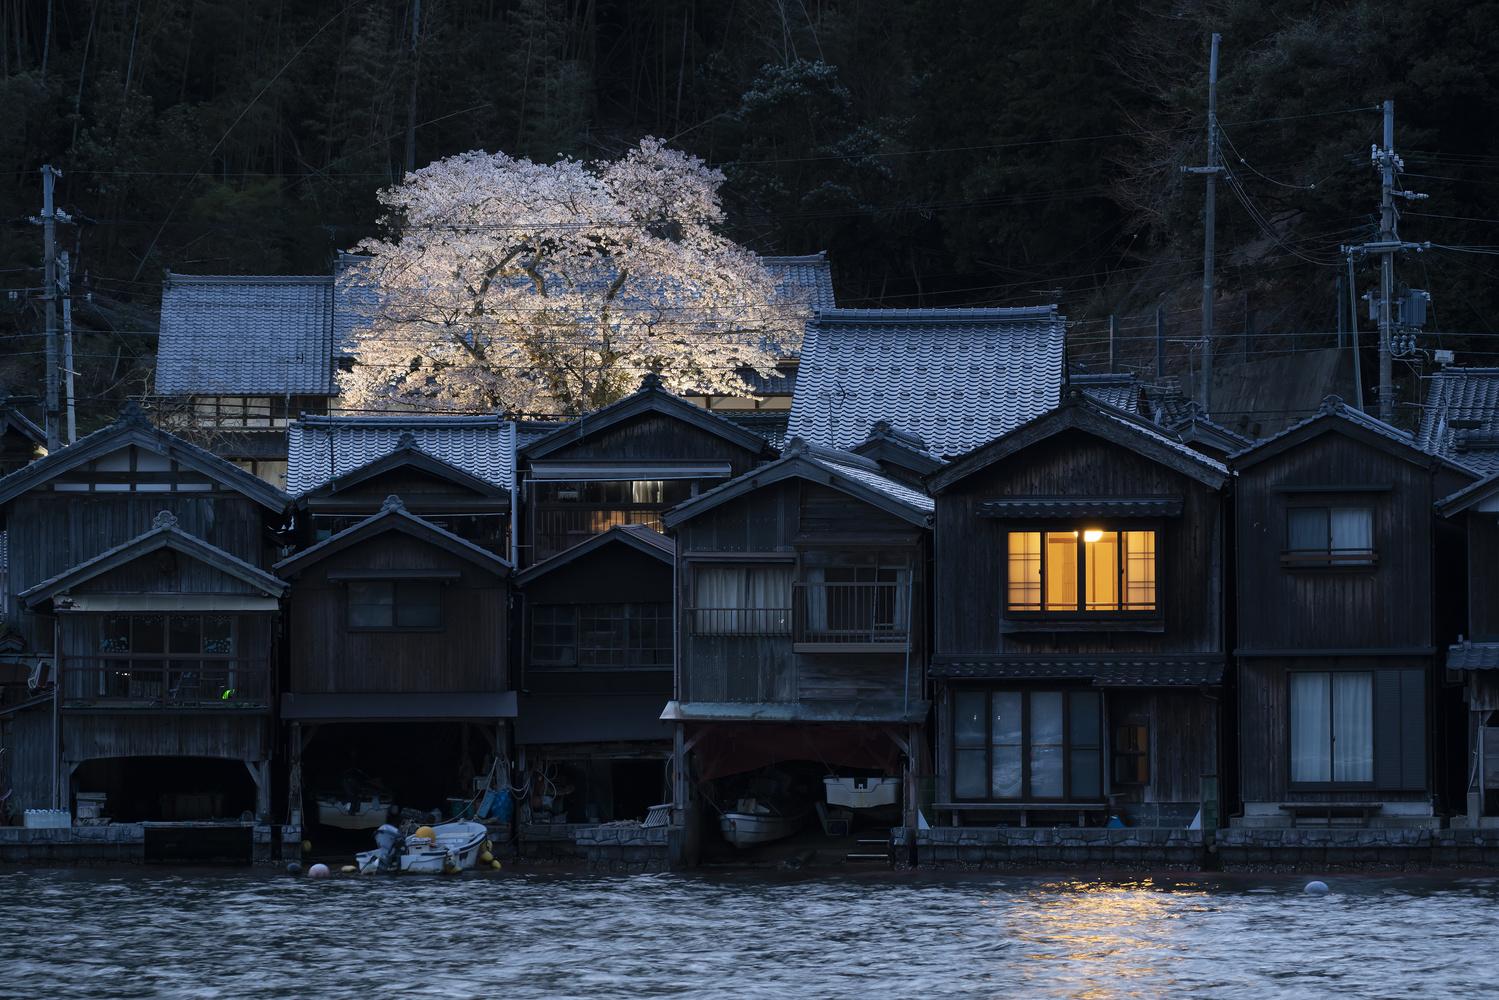 The beginning of the night by kousuke kitajima